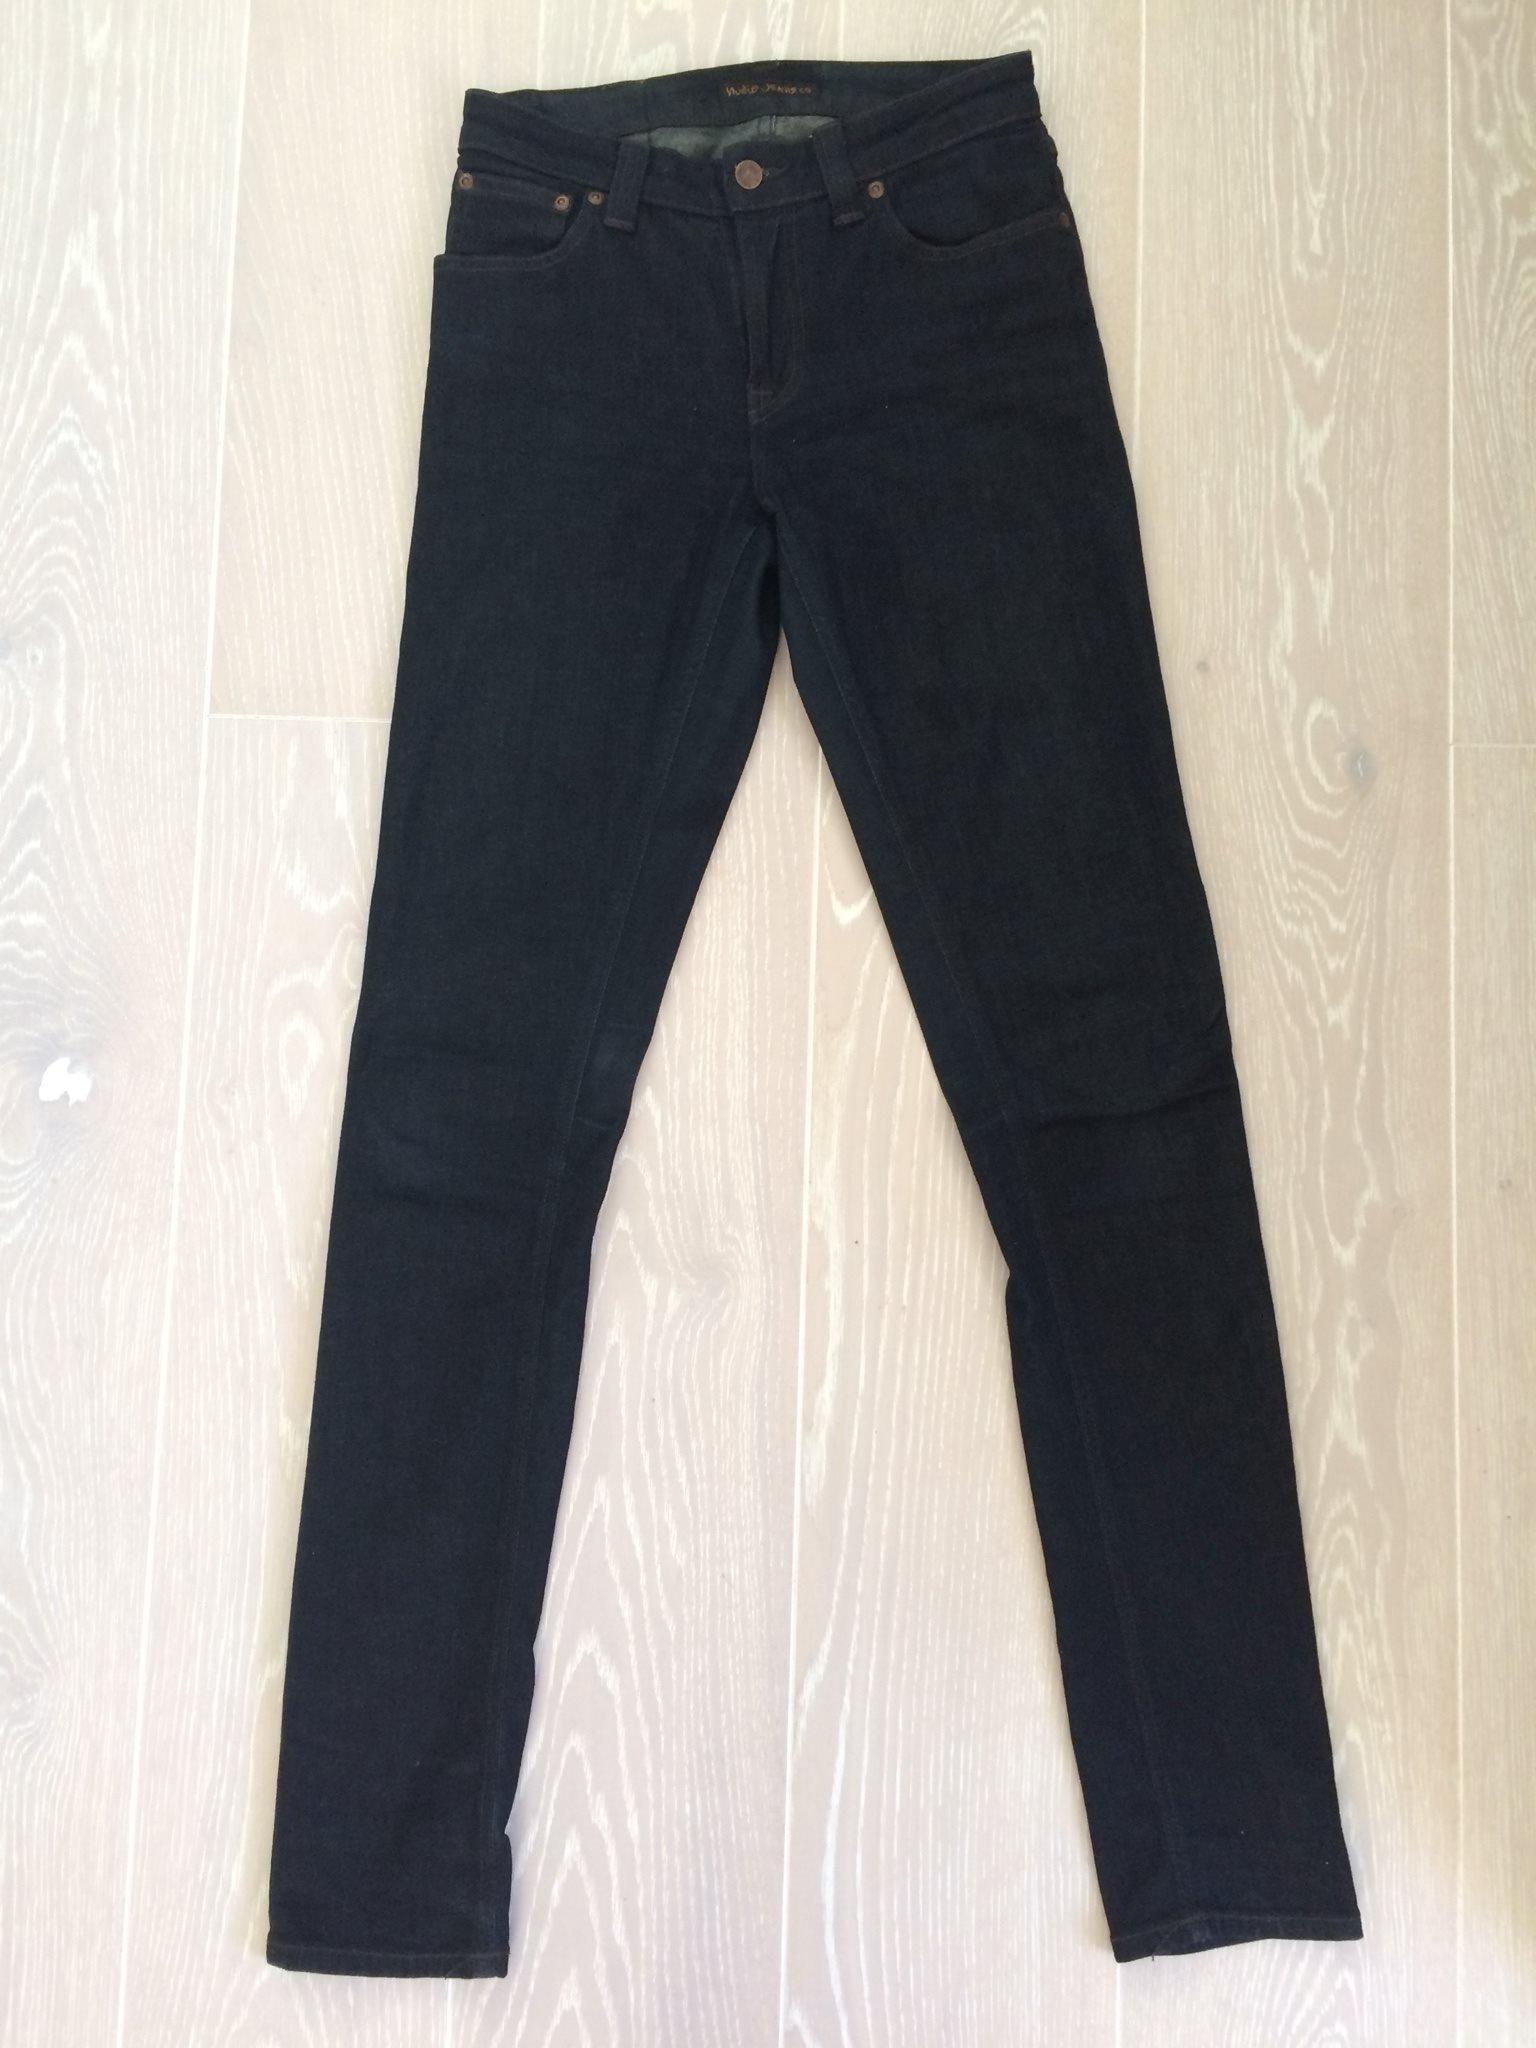 utsökt design fabrikspris gratis frakt Nya Nudie jeans organic mörkblå tjej dam (model.. (346153909 ...